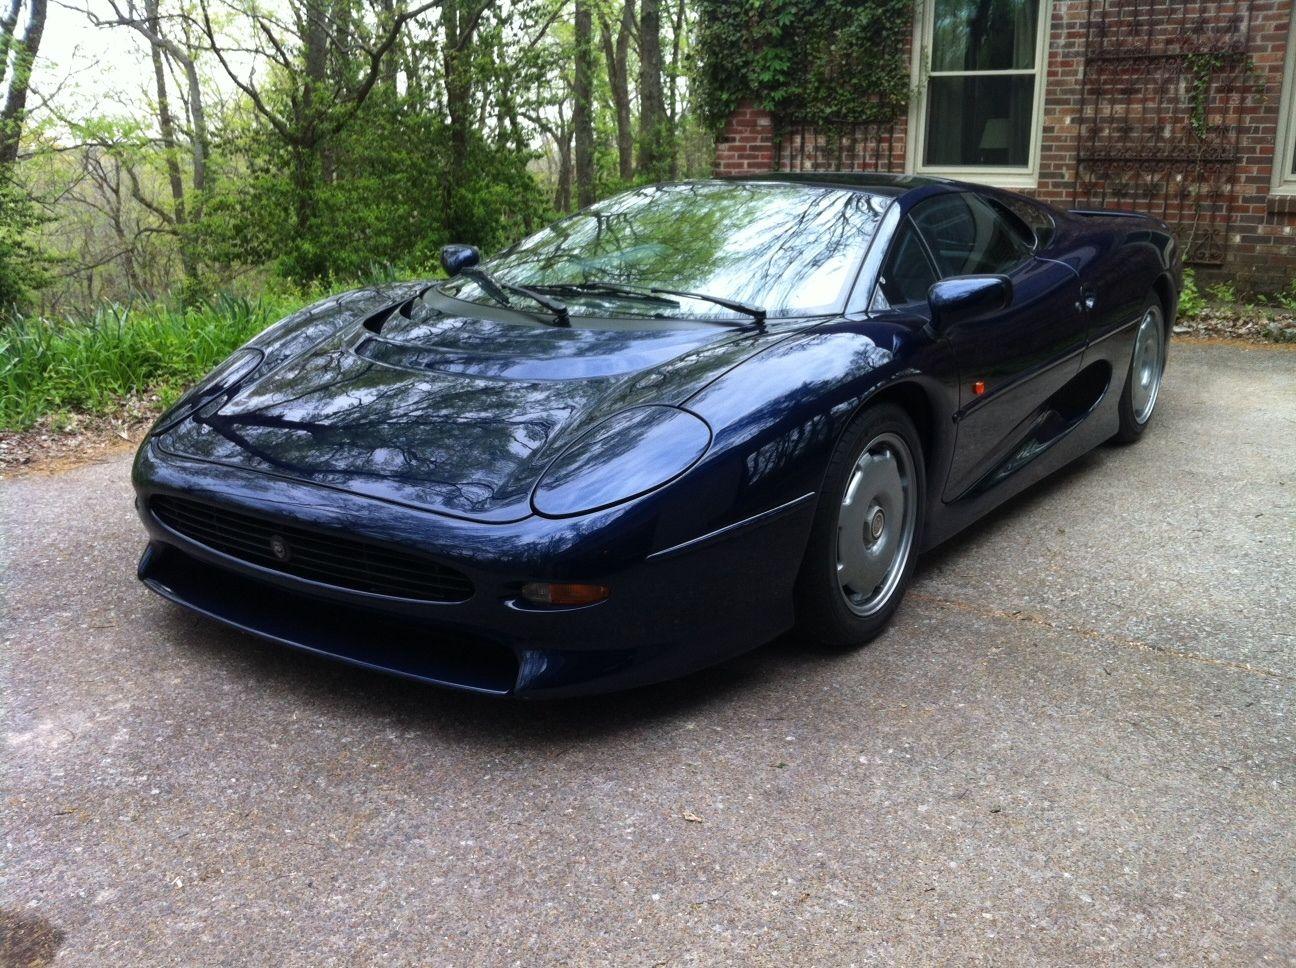 last jaguar xj220 ever built sold on ebay for $299k - autoevolution